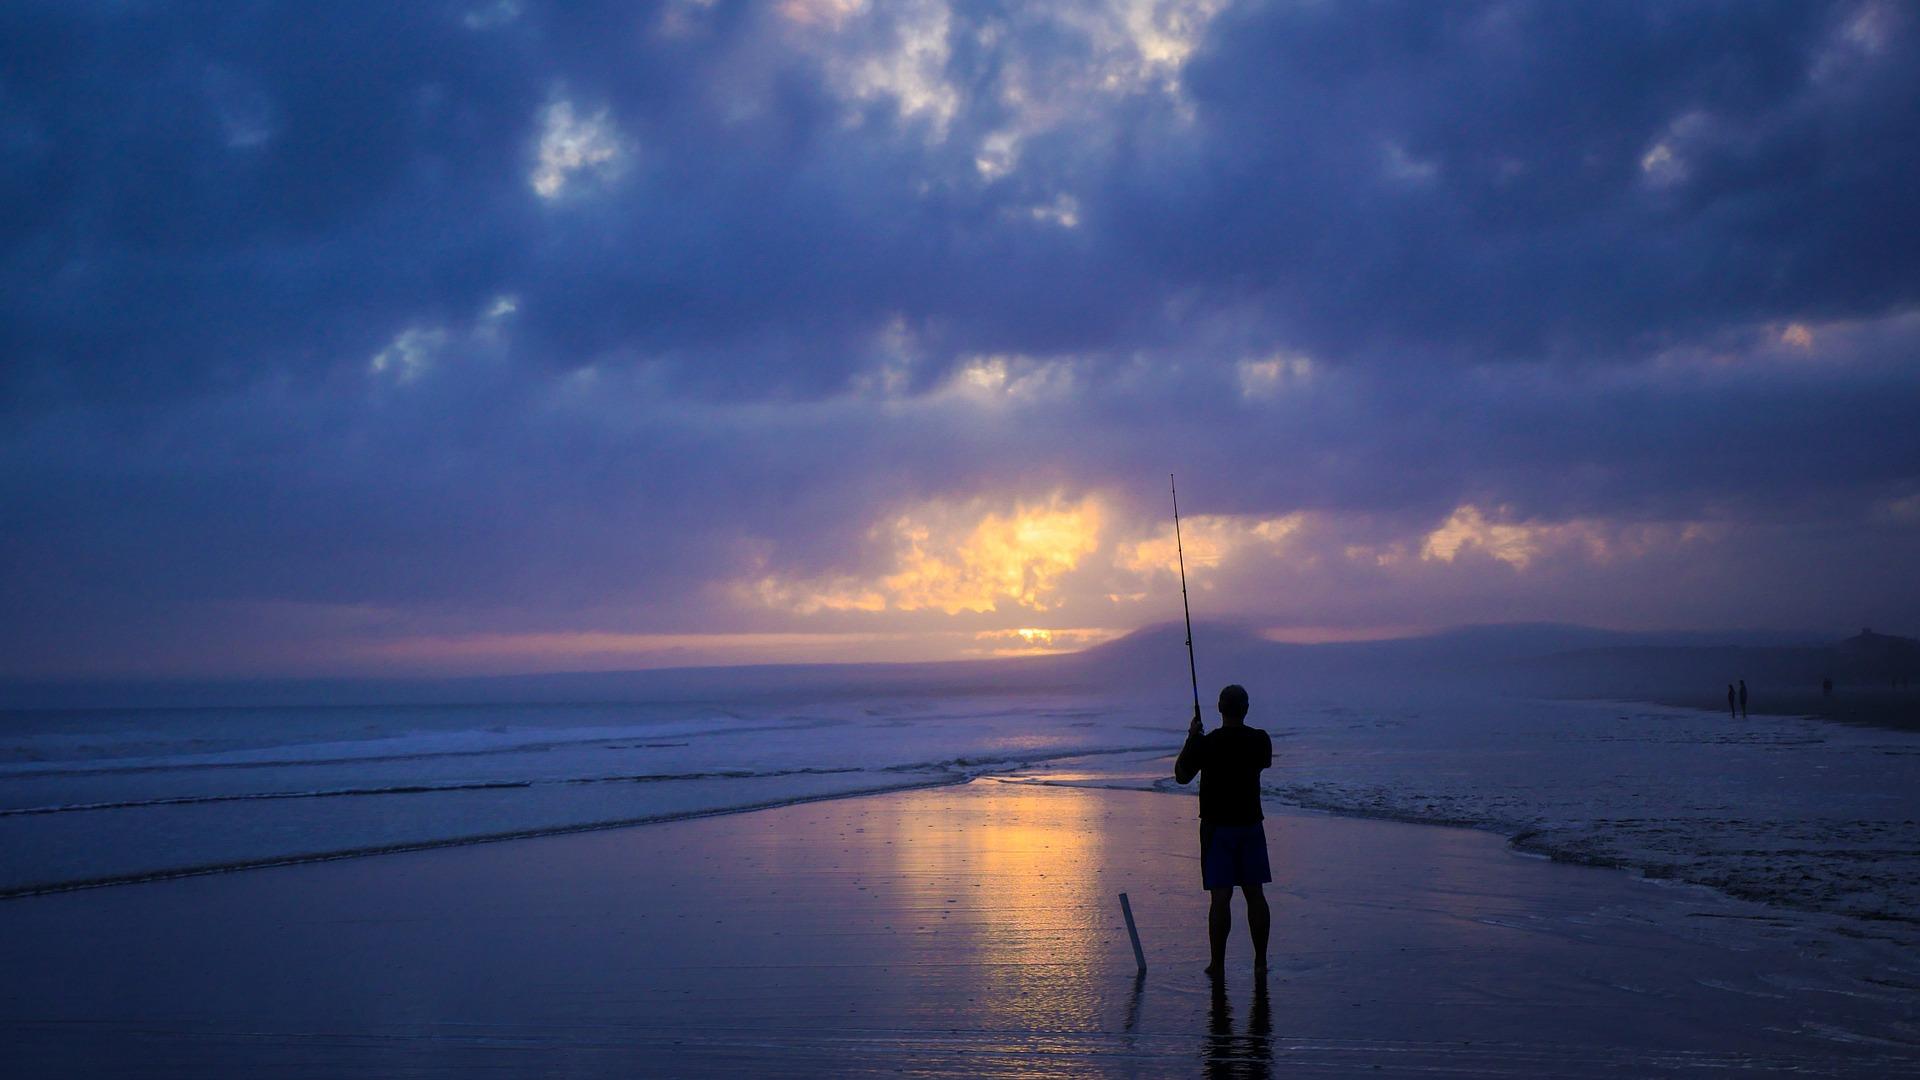 fisherman-1149682_1920.jpg